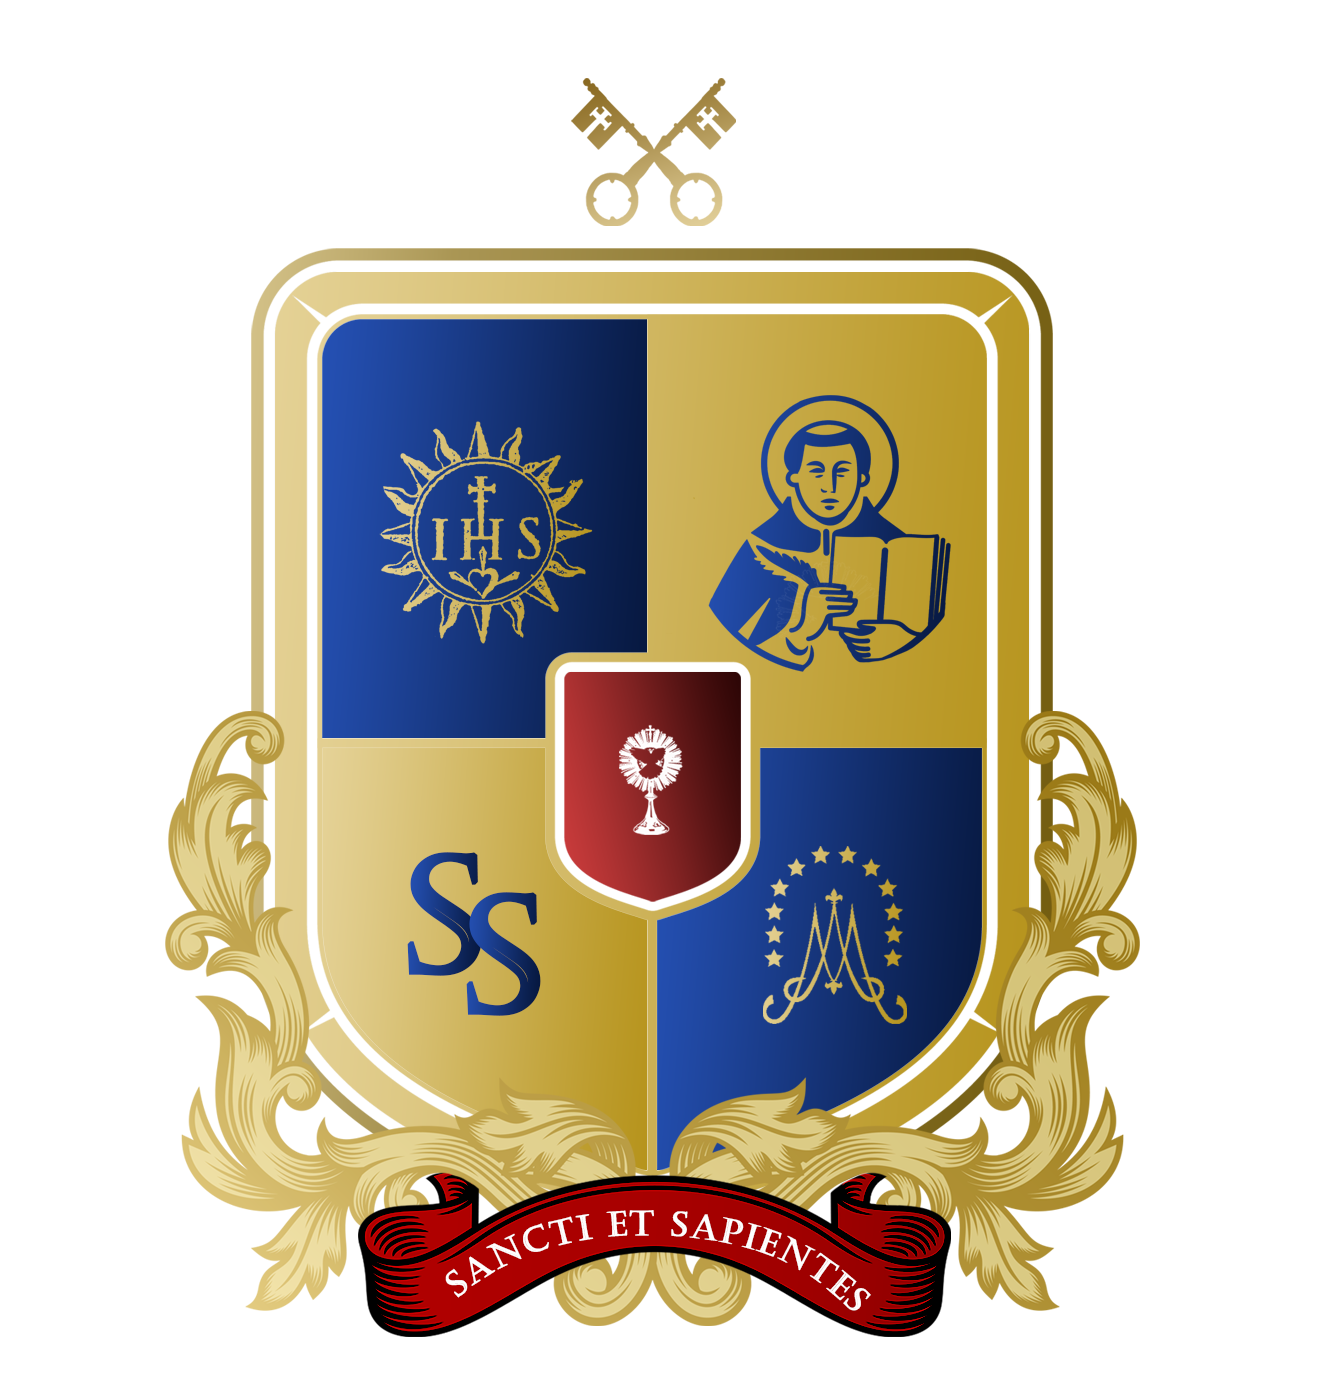 https://www.santosesabios.org.br/wp-content/uploads/2021/03/cropped-png-logo-santos-e-sabios.png